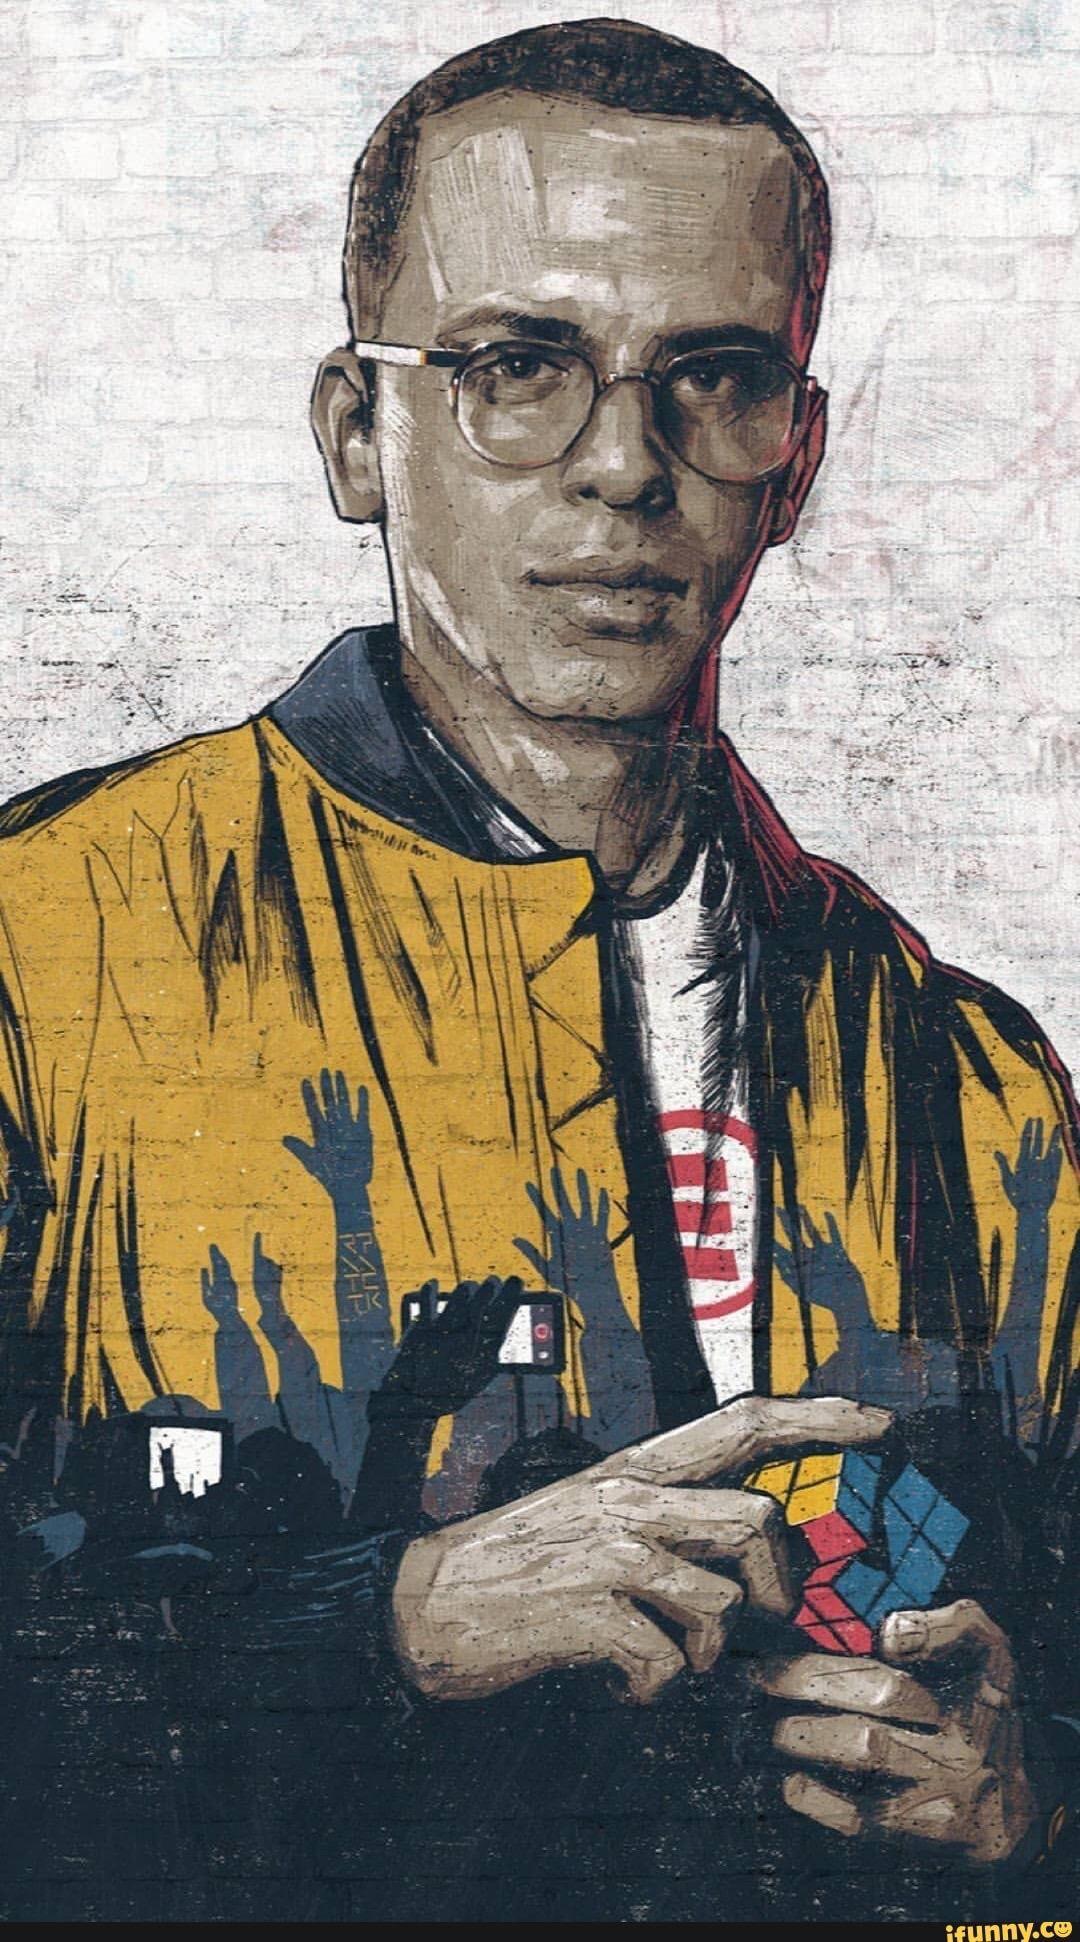 Pin By Ser Na Ramirez On Logic Logic Art Logic Rapper Wallpaper Logic Rapper